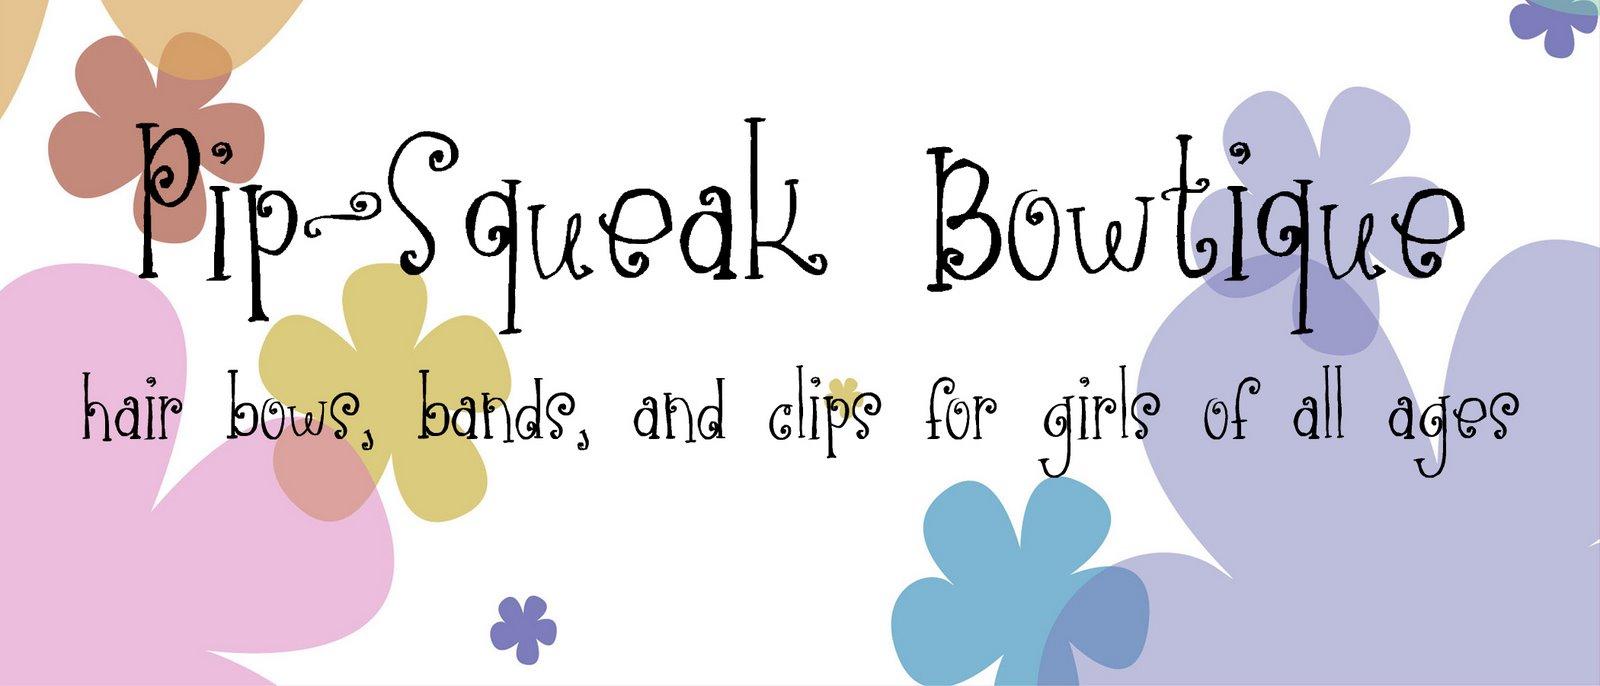 Pip-Squeak Bowtique Baby Bows